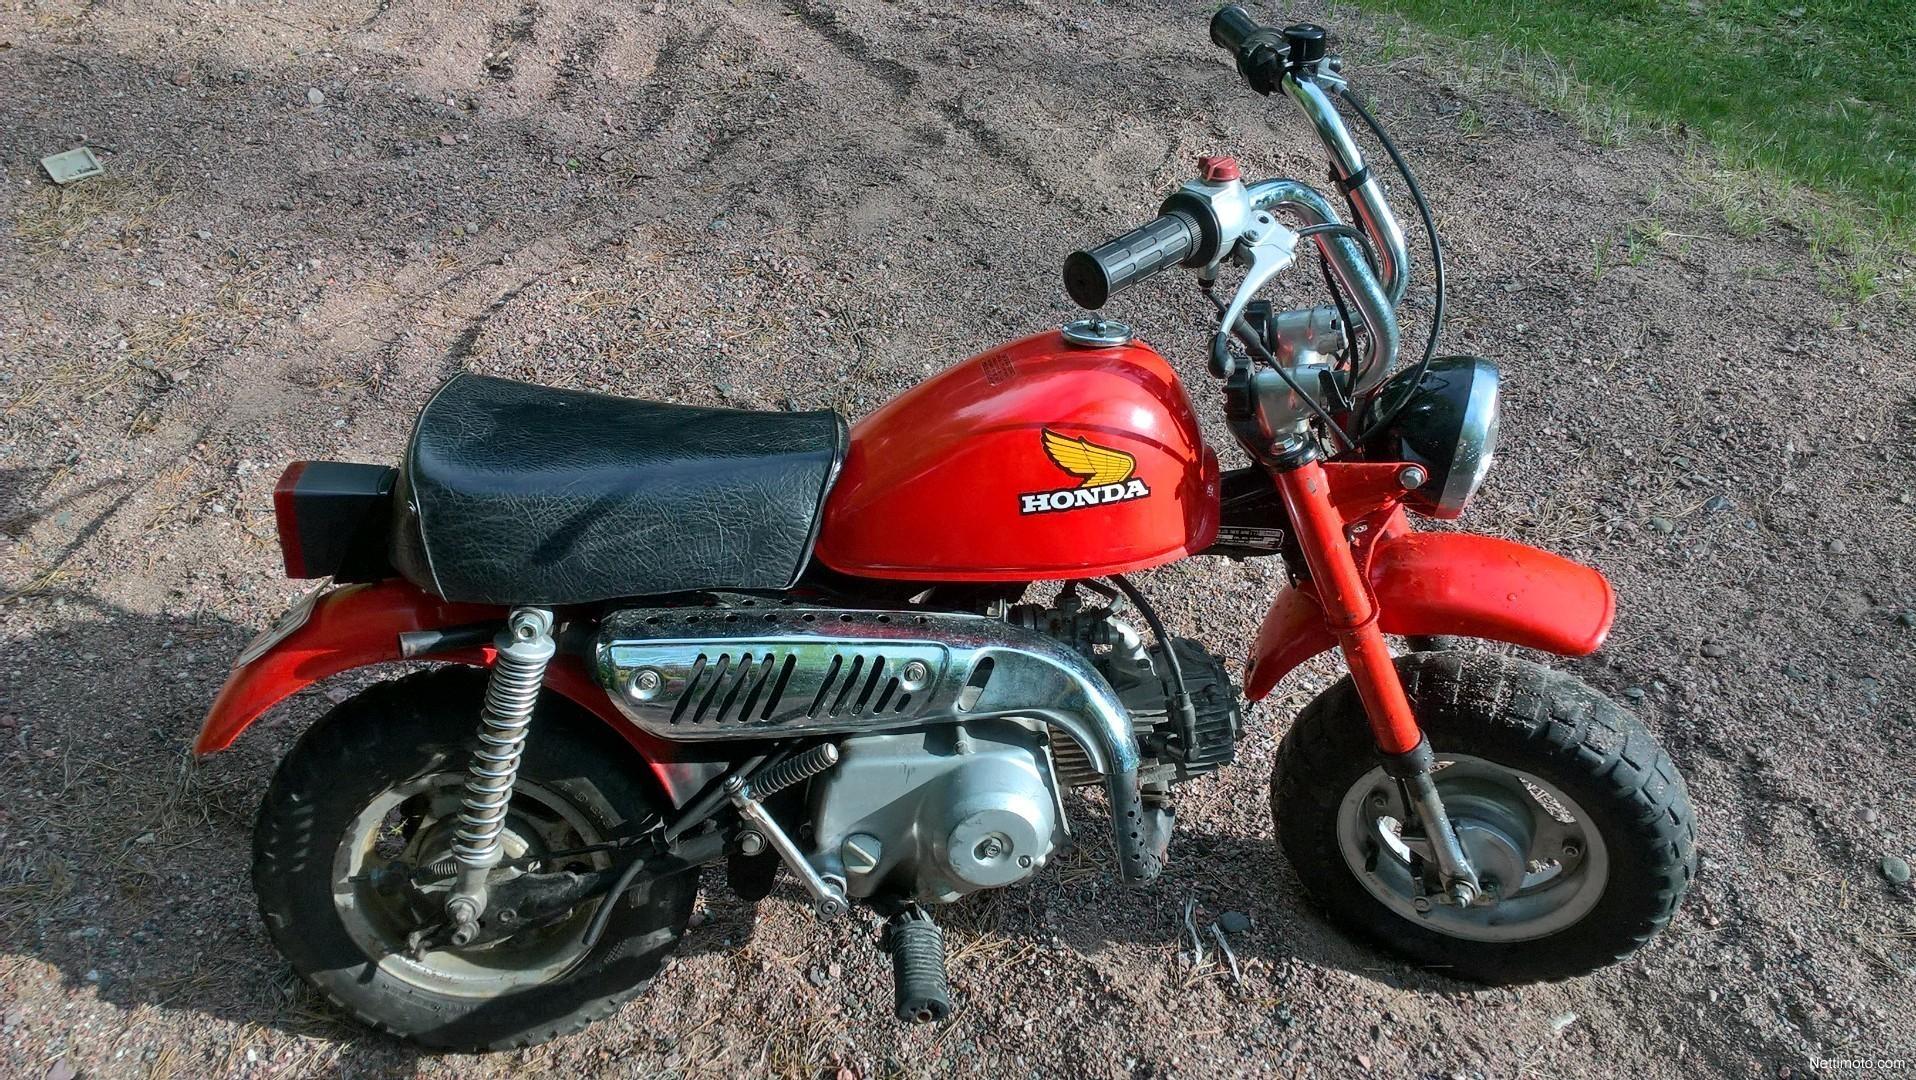 Honda Monkey 50 50 cm³ 1981 - Turku - Mopo - Nettimoto